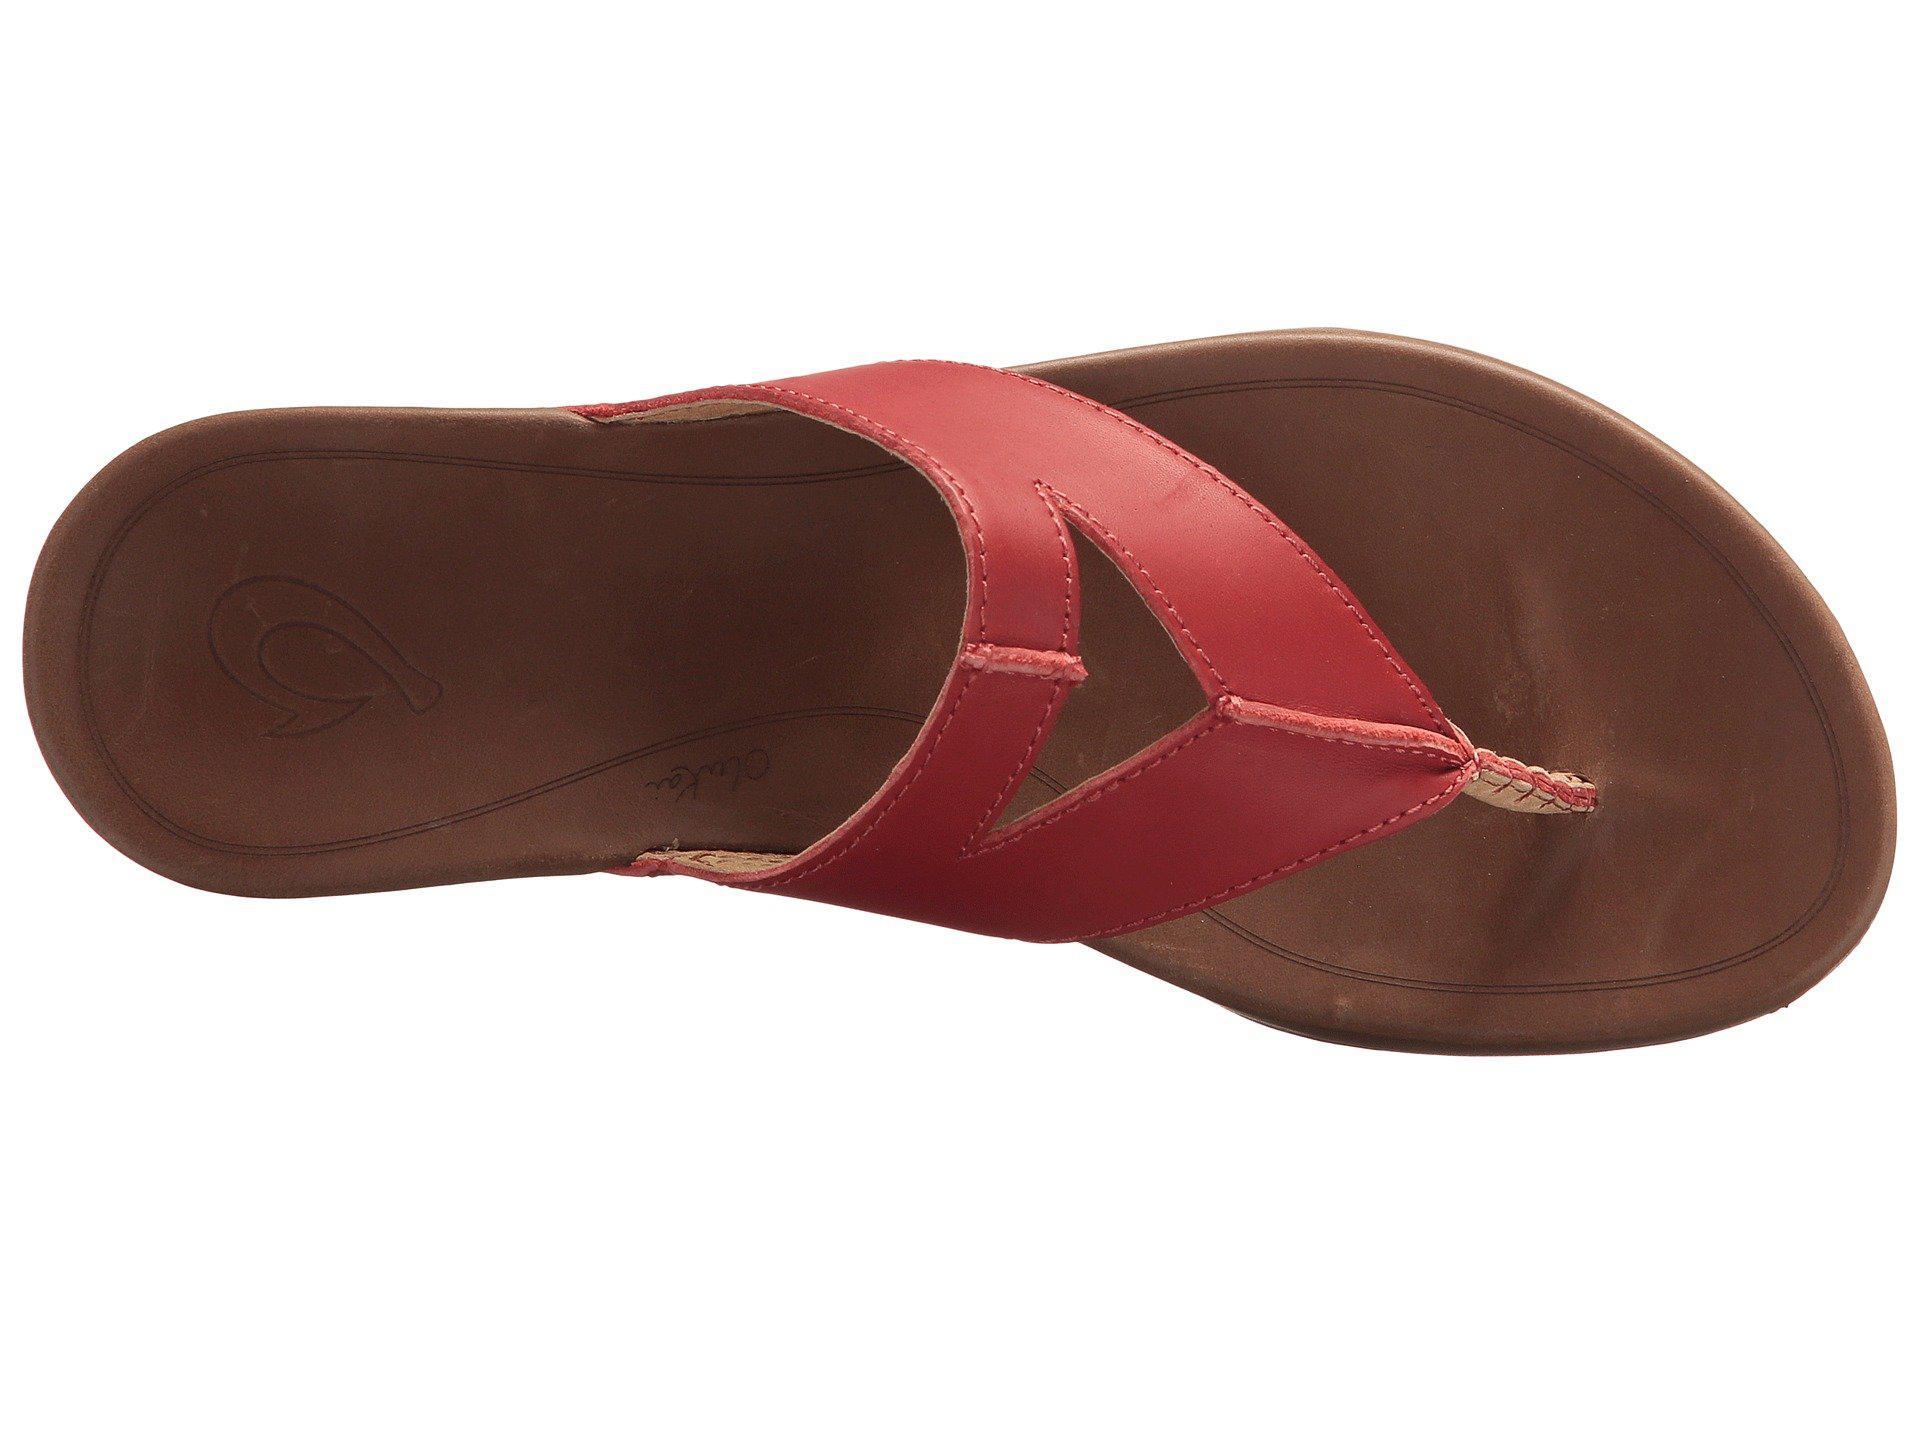 a2e39ff70203 Olukai - Multicolor Lala (black tan) Women s Sandals - Lyst. View fullscreen